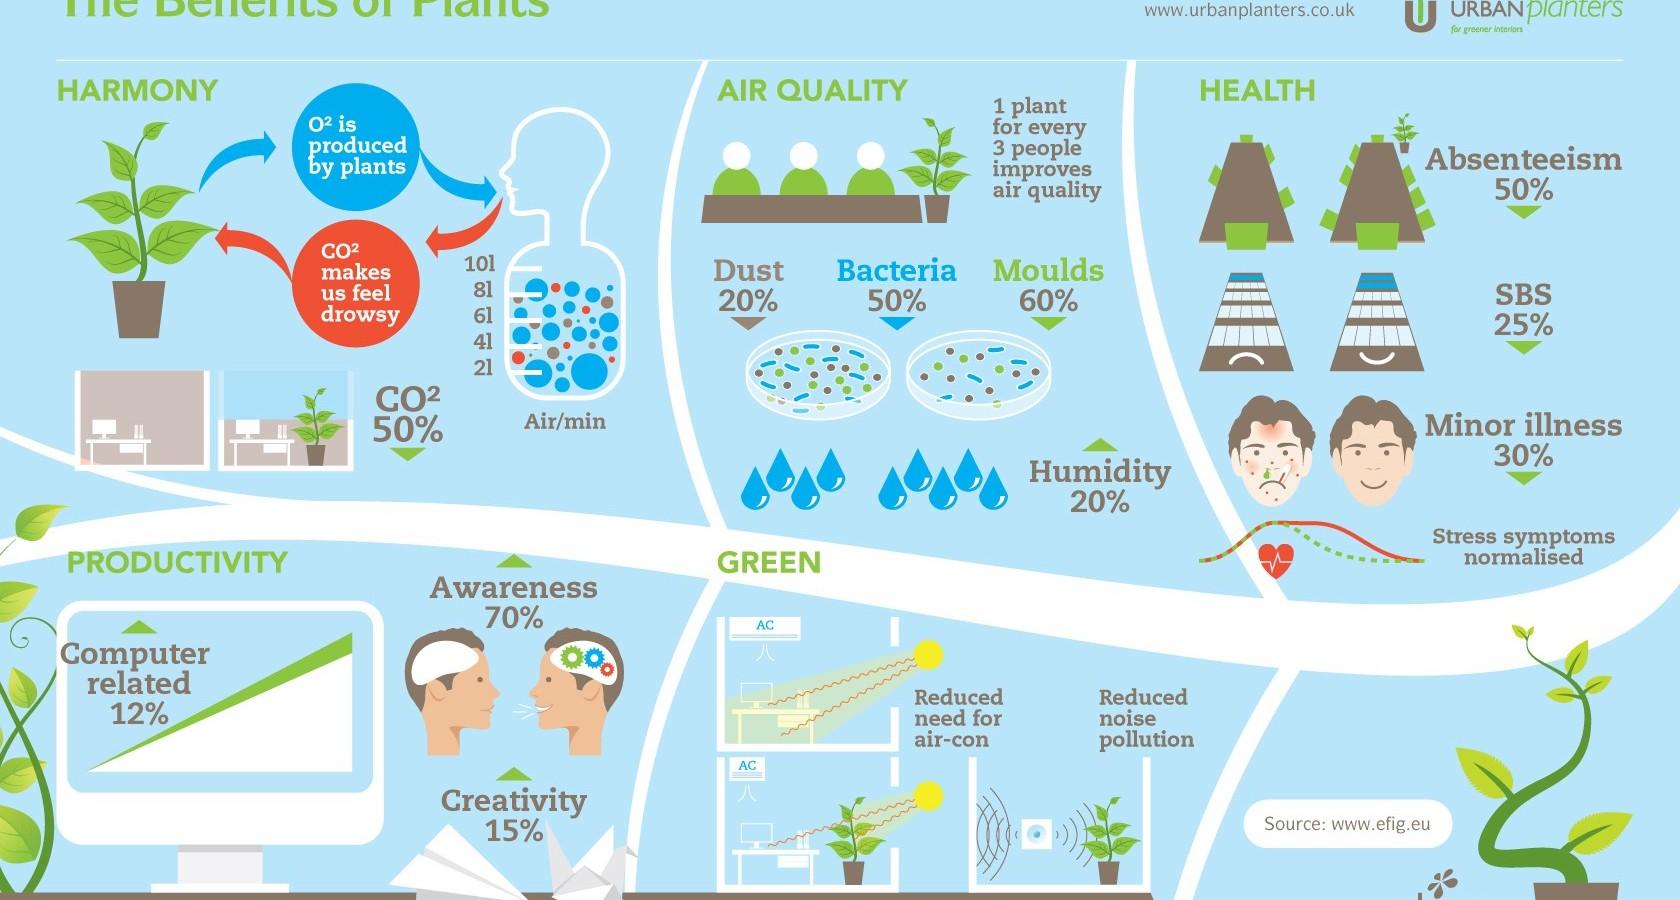 Health Benefits Infographic